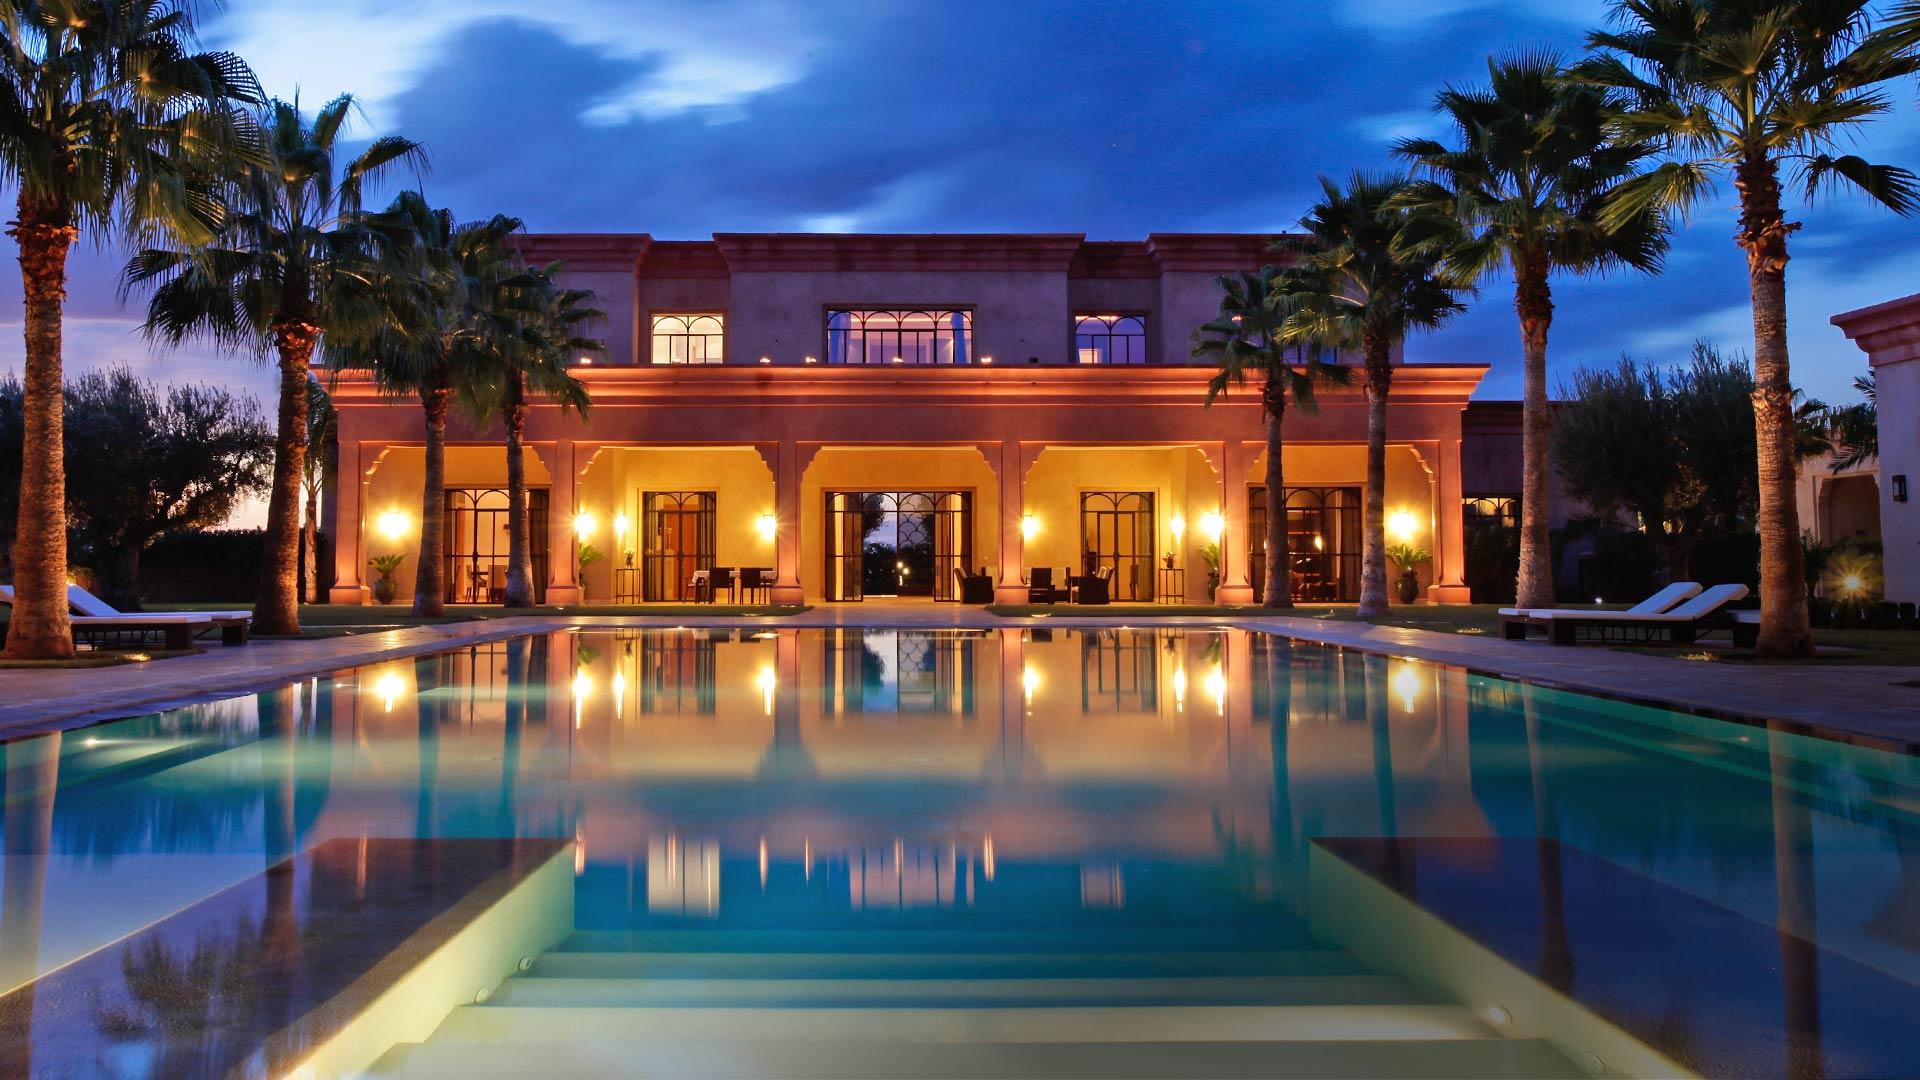 luxury-villa-rentals-vacation-rentals-luxury-italian-villa-for-rental.jpg